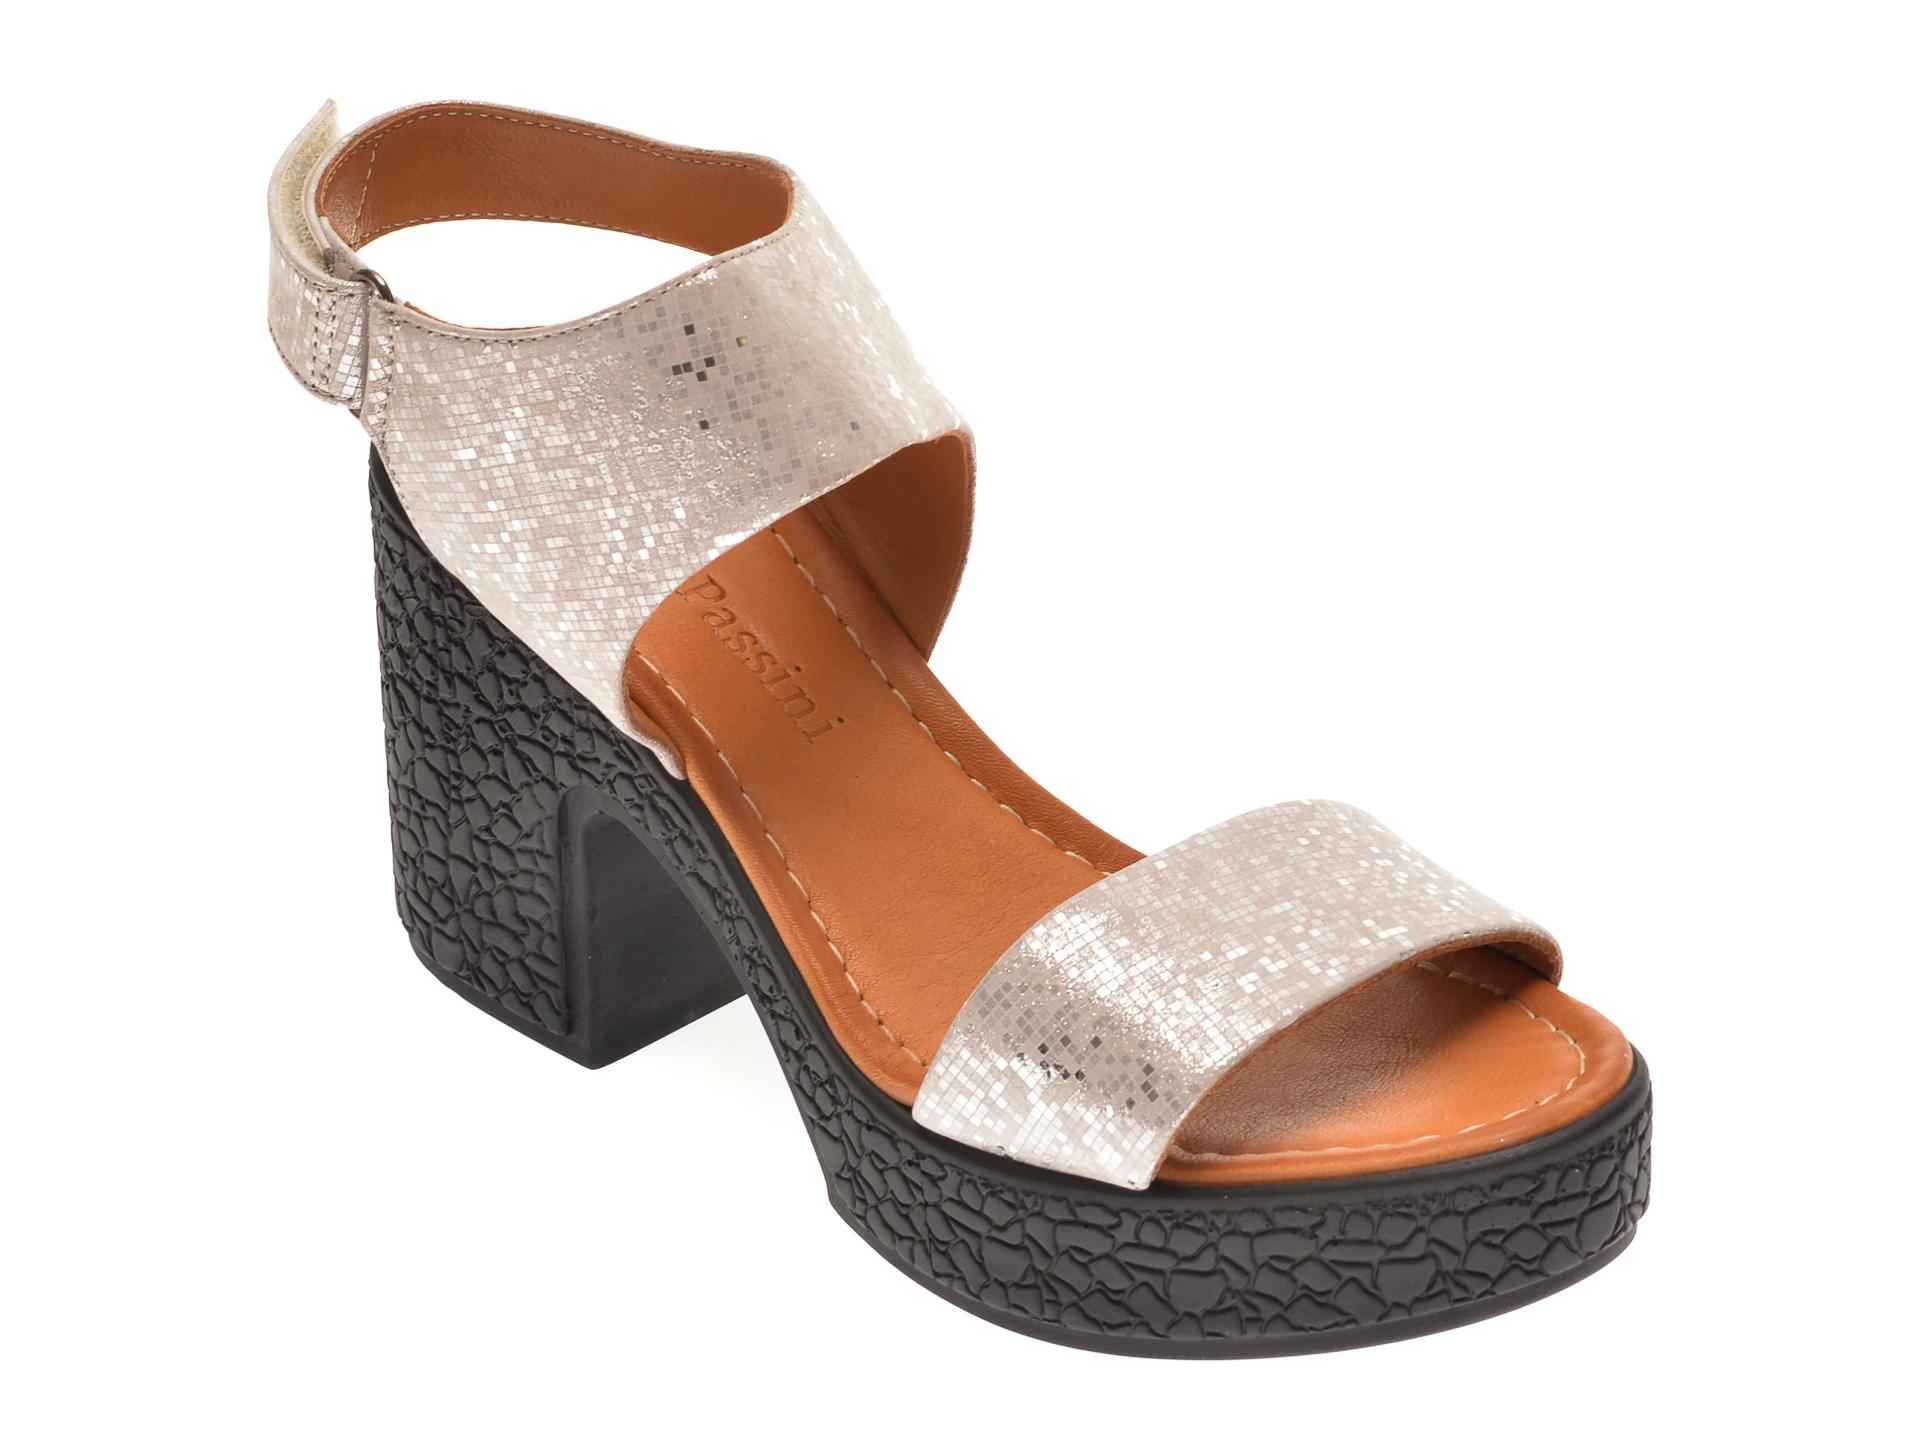 Sandale FLAVIA PASSINI bej, 1181335, din piele naturala